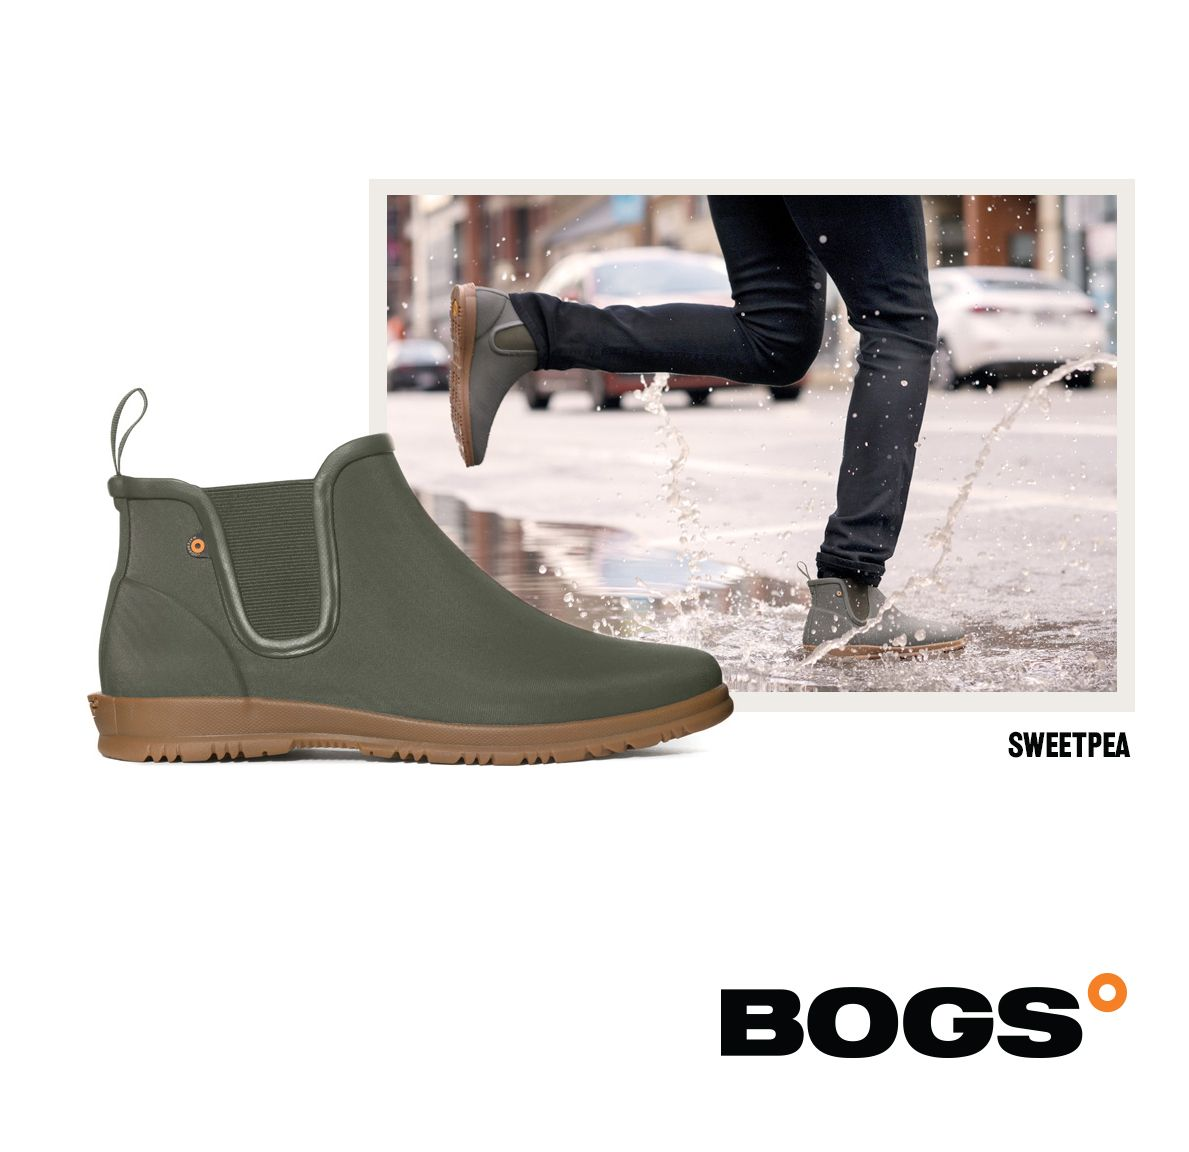 BOGS Womens Sweetpea Chelsea Winter Waterproof Insulated Winter Snow Boot